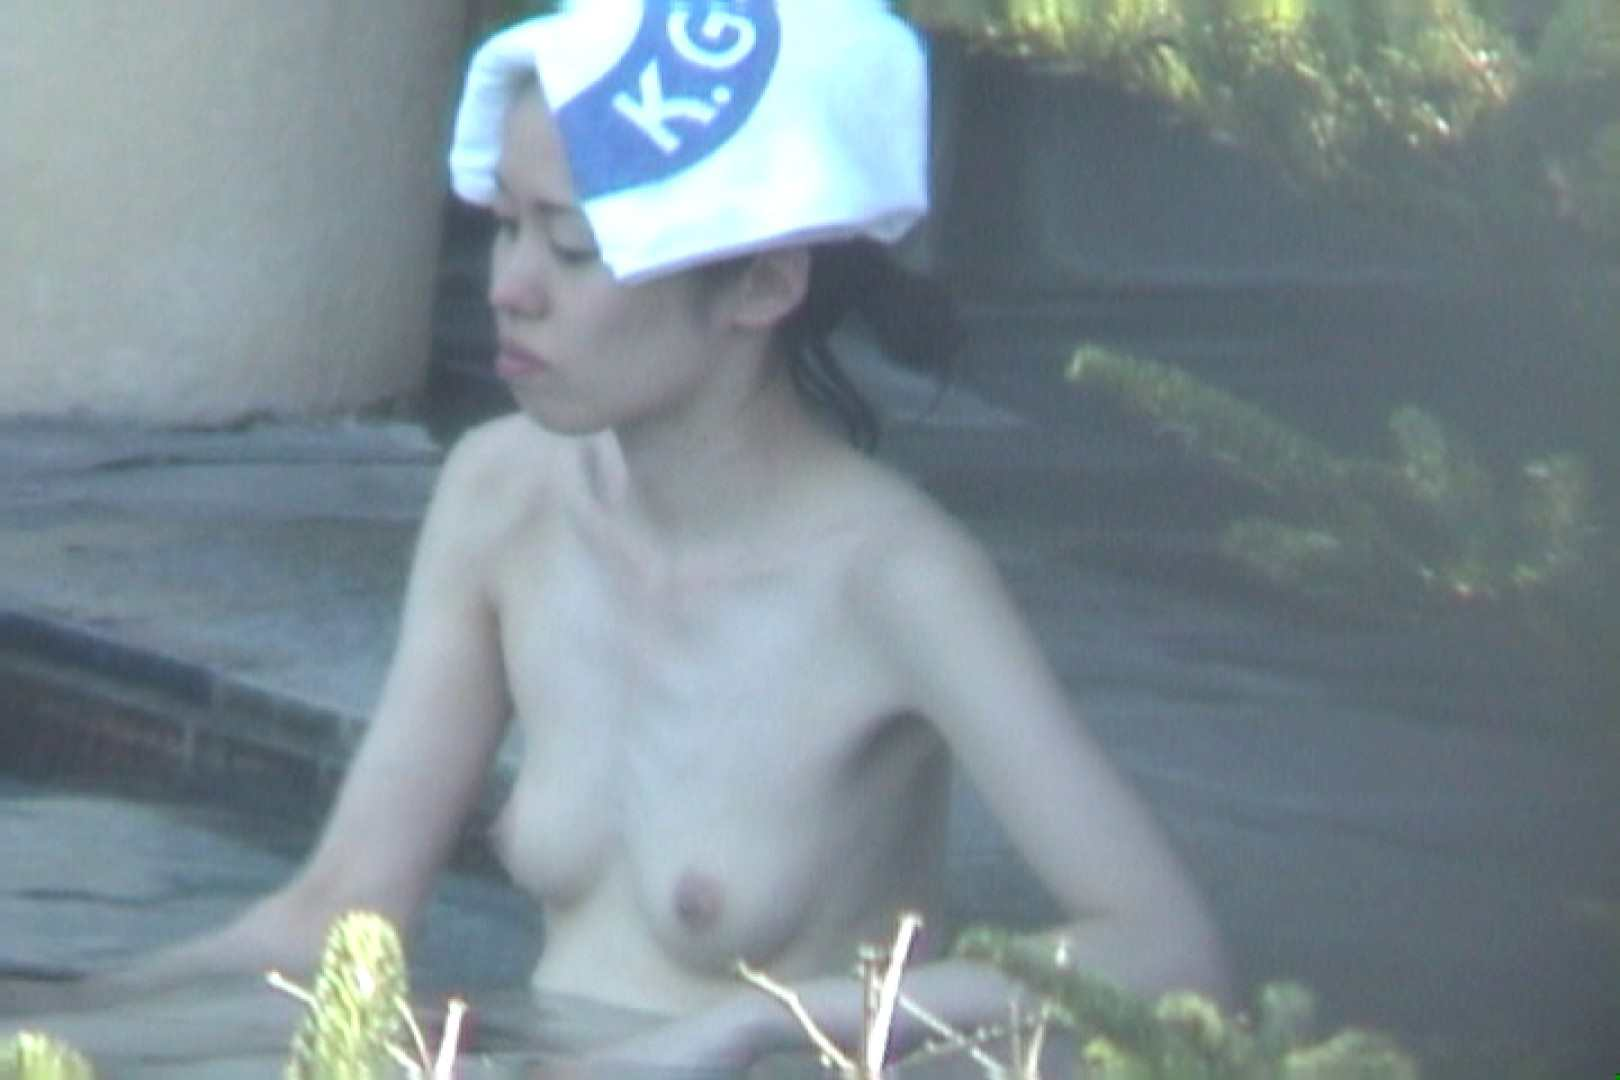 Aquaな露天風呂Vol.576 盗撮特撮 | OLのプライベート  13pic 10